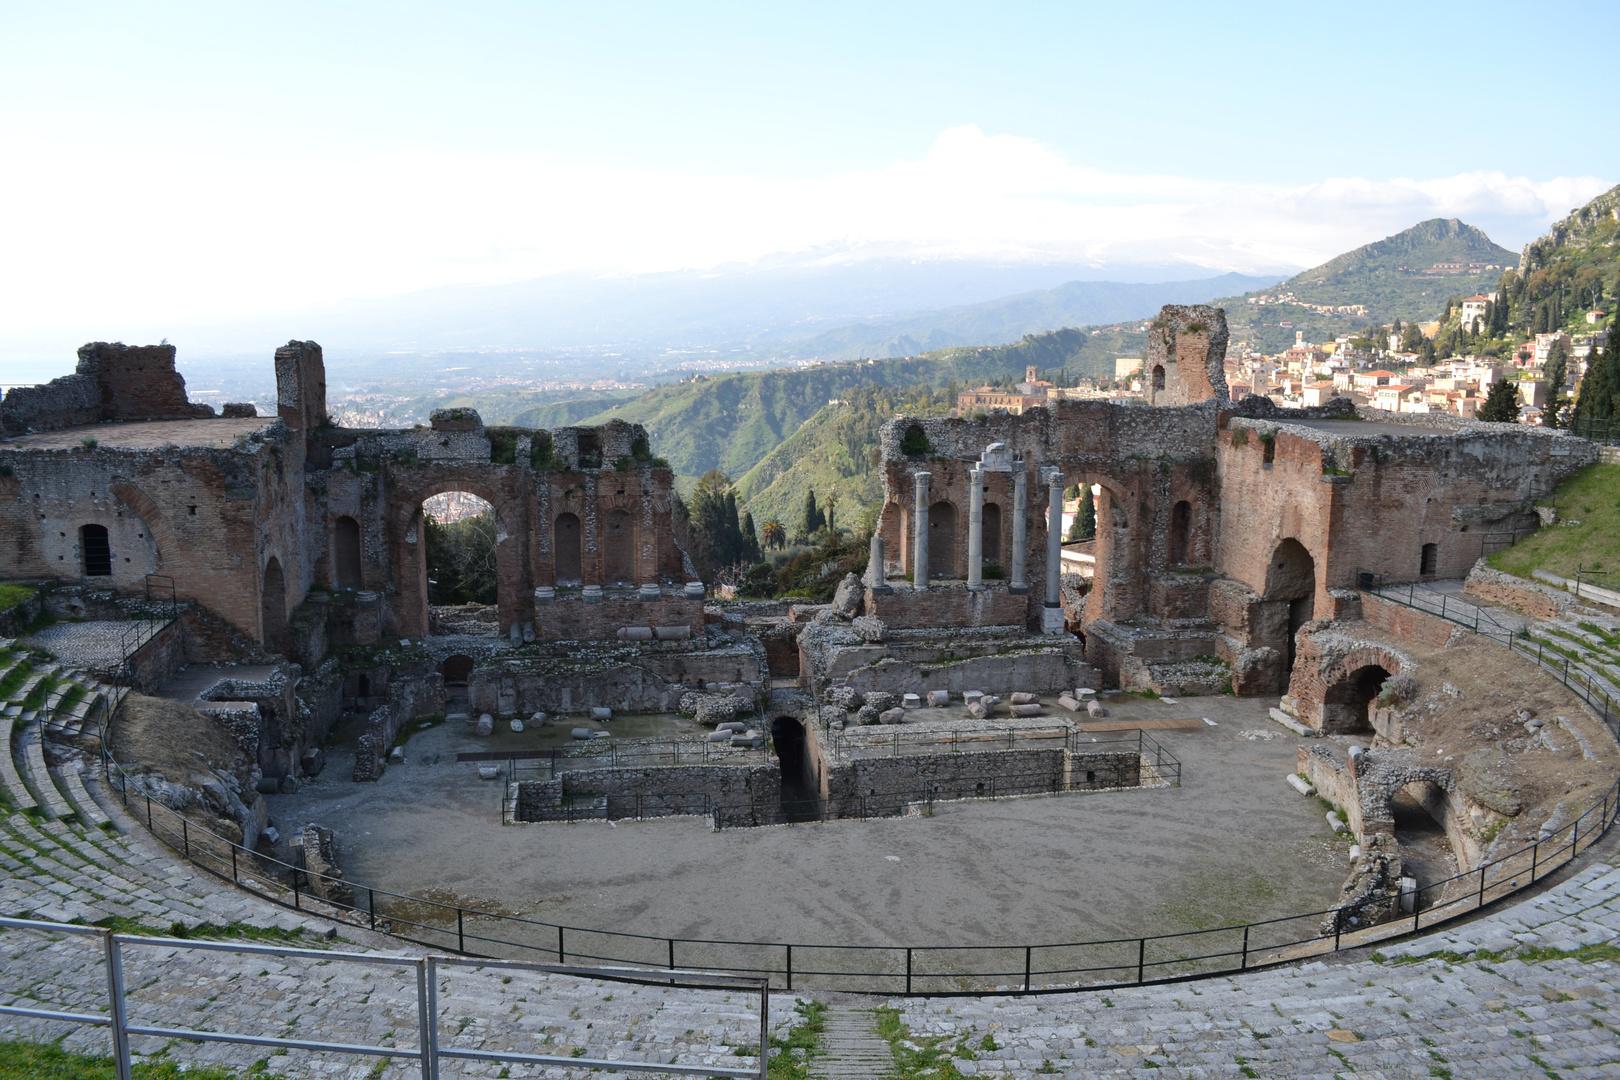 Théâtre gréco-romain, Taormina